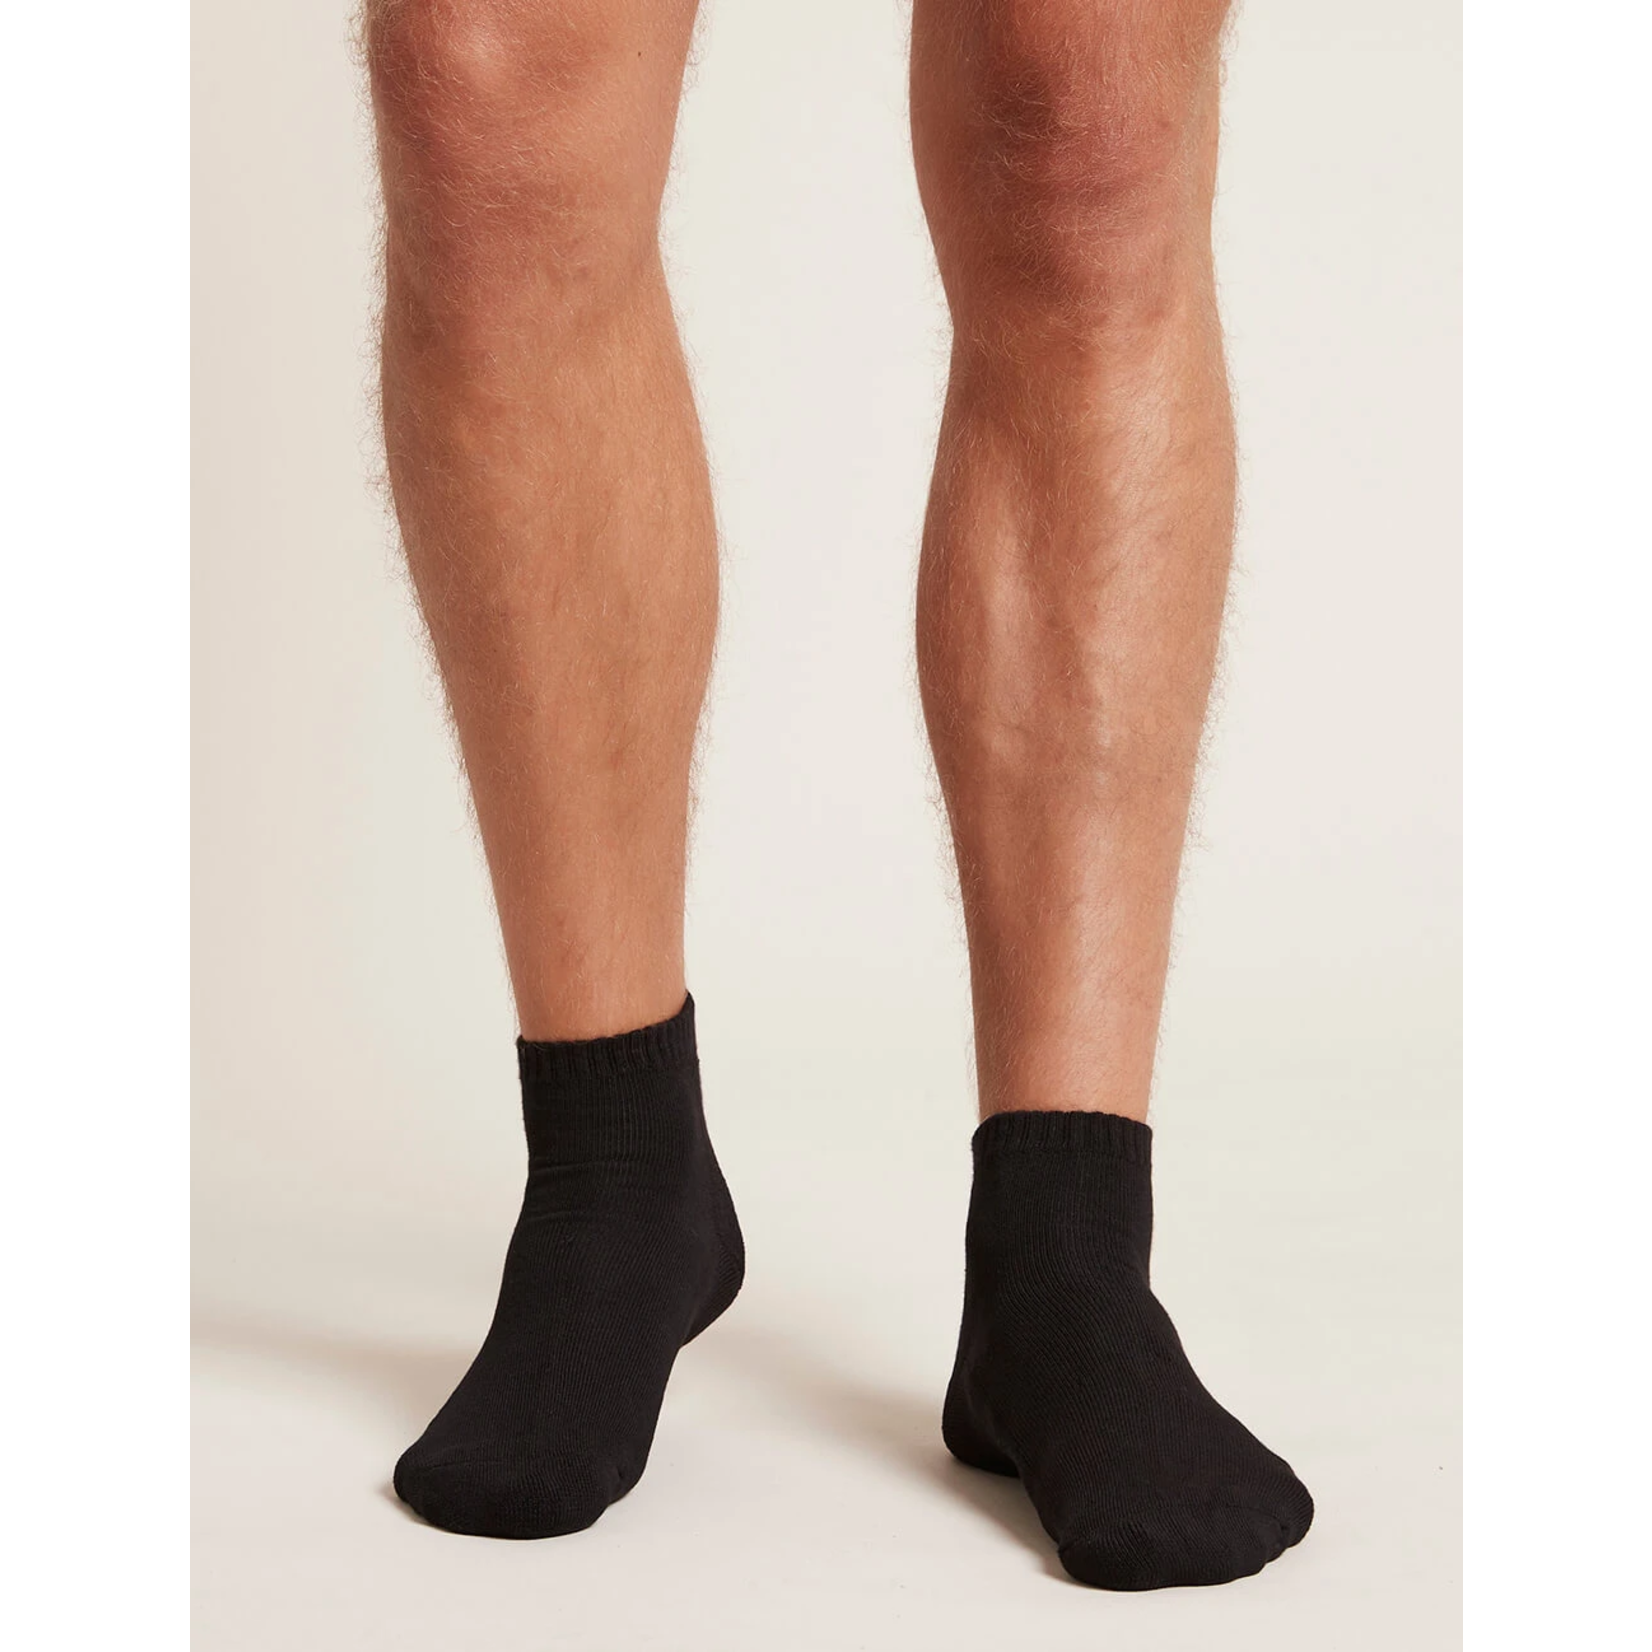 Boody Boody Men's Cushioned Sport Ankle Socks